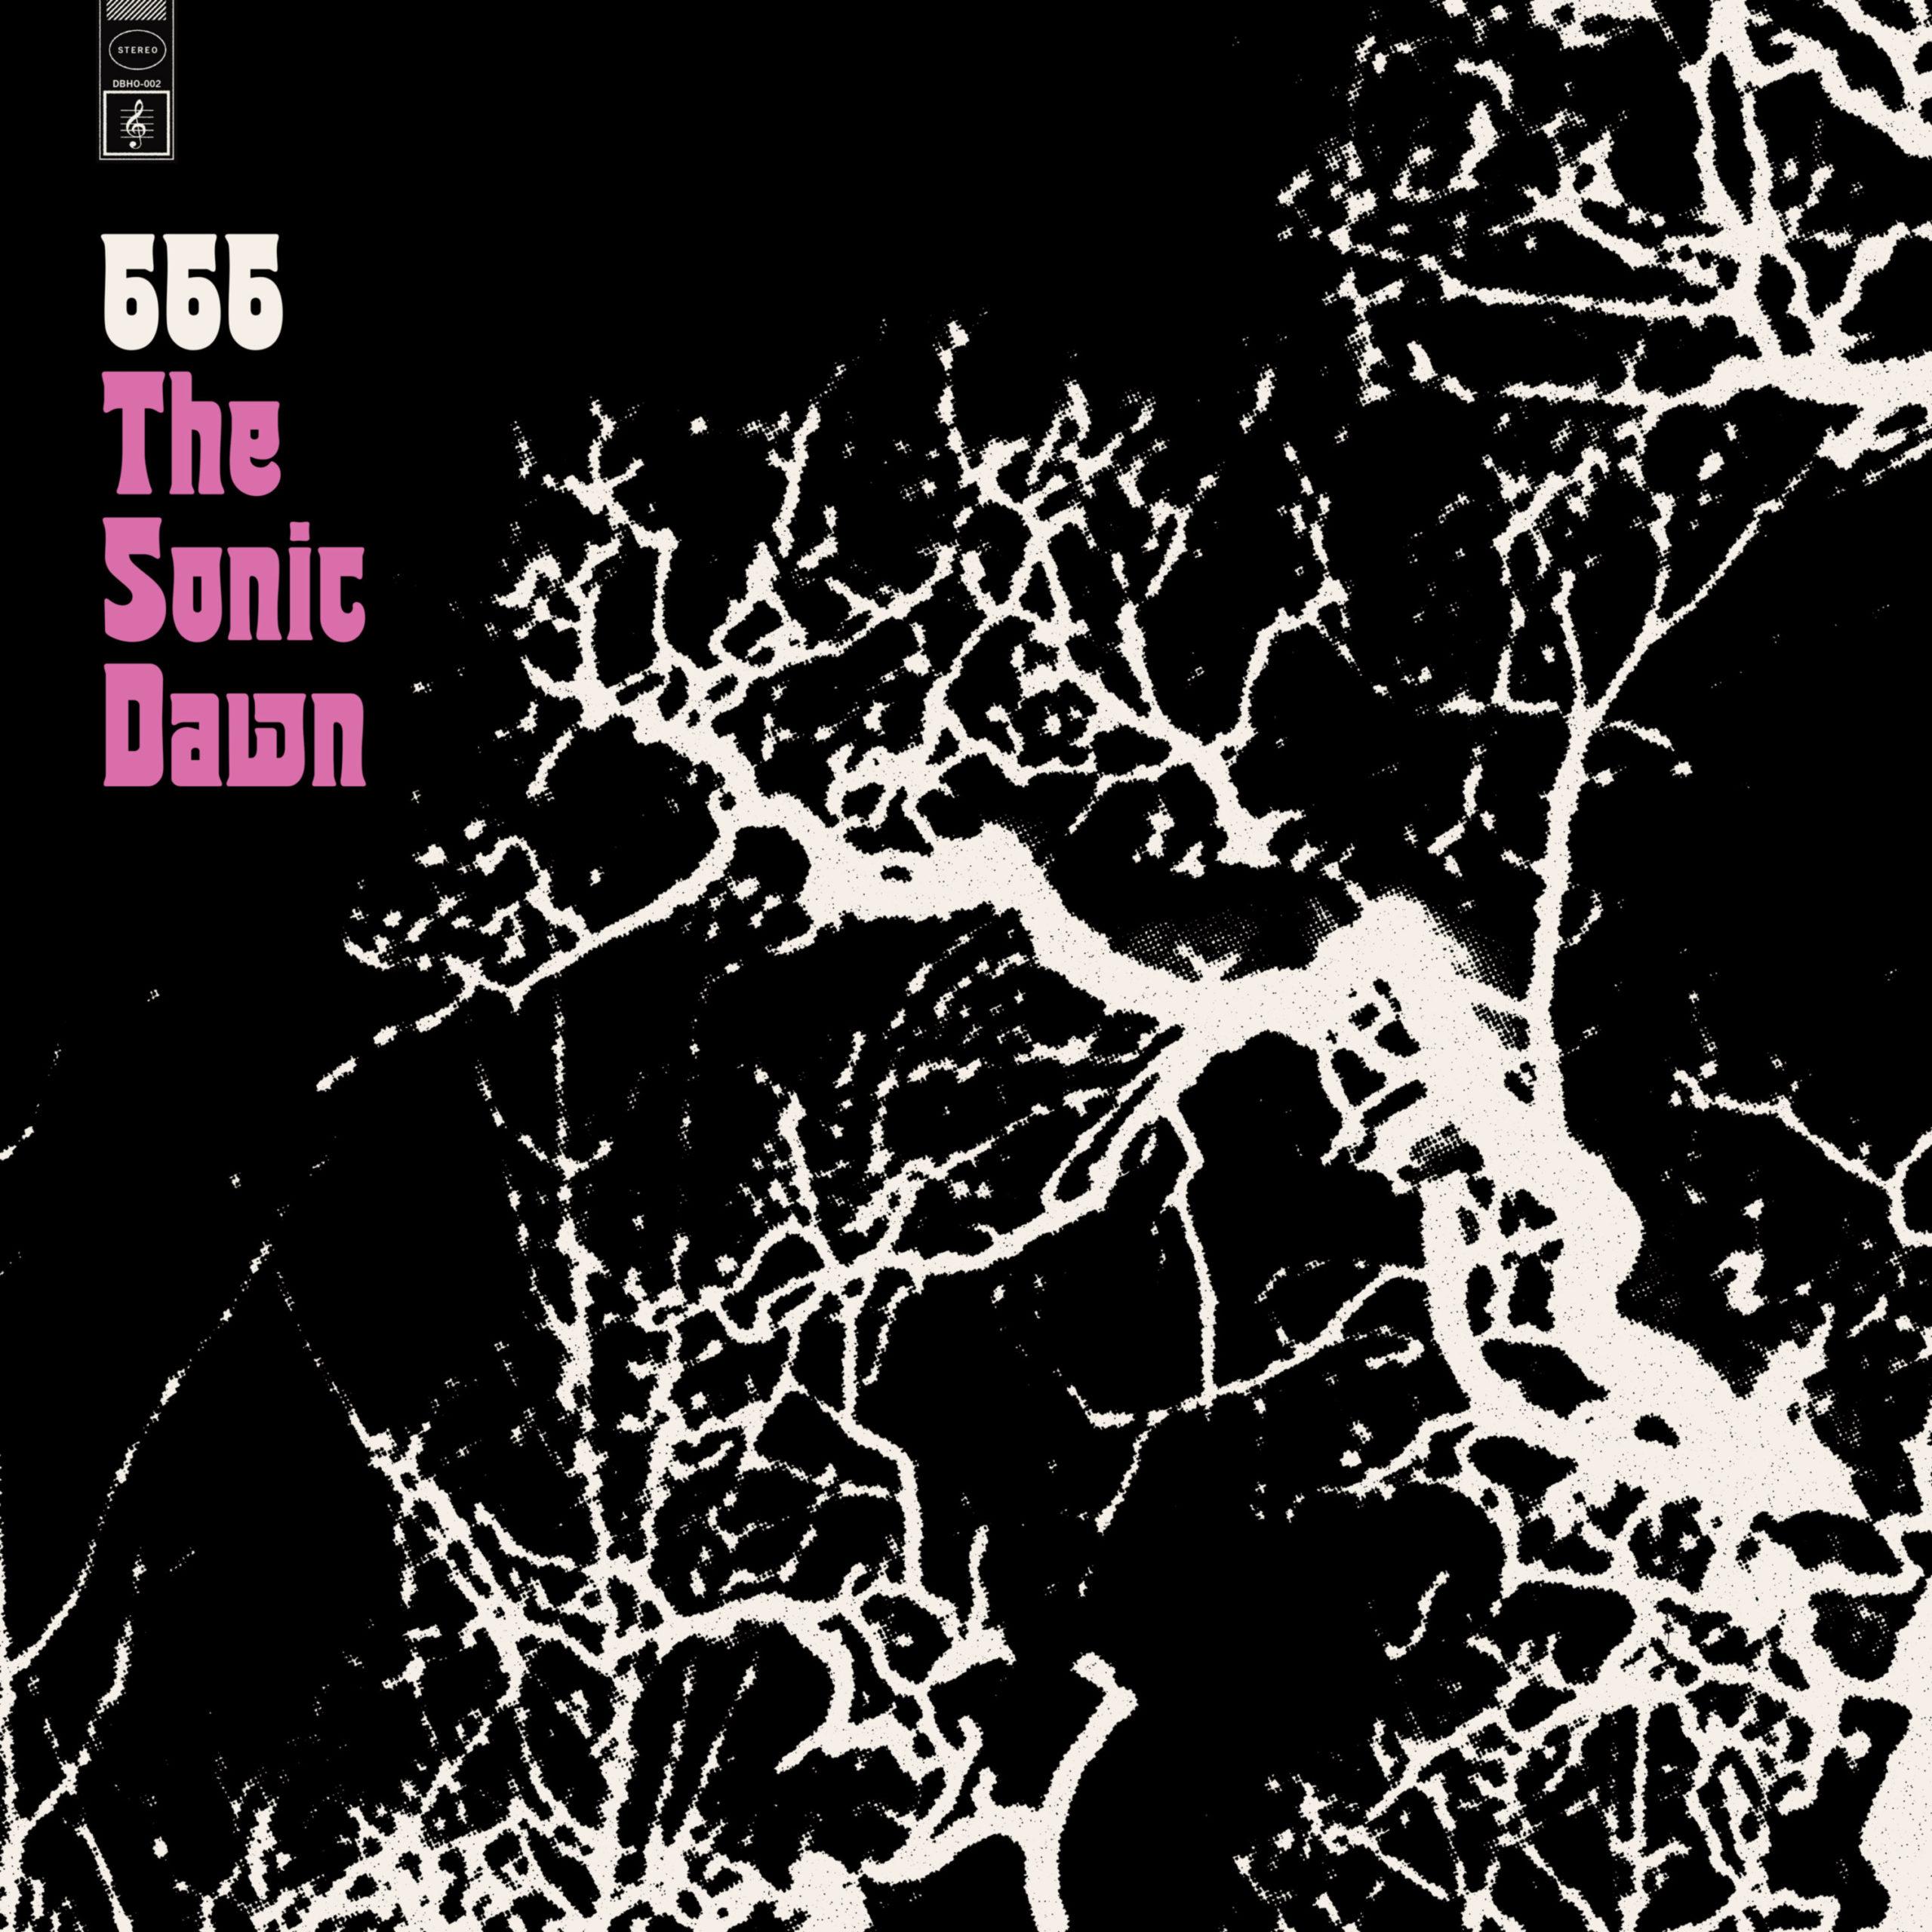 the sonic dawn 666 single art